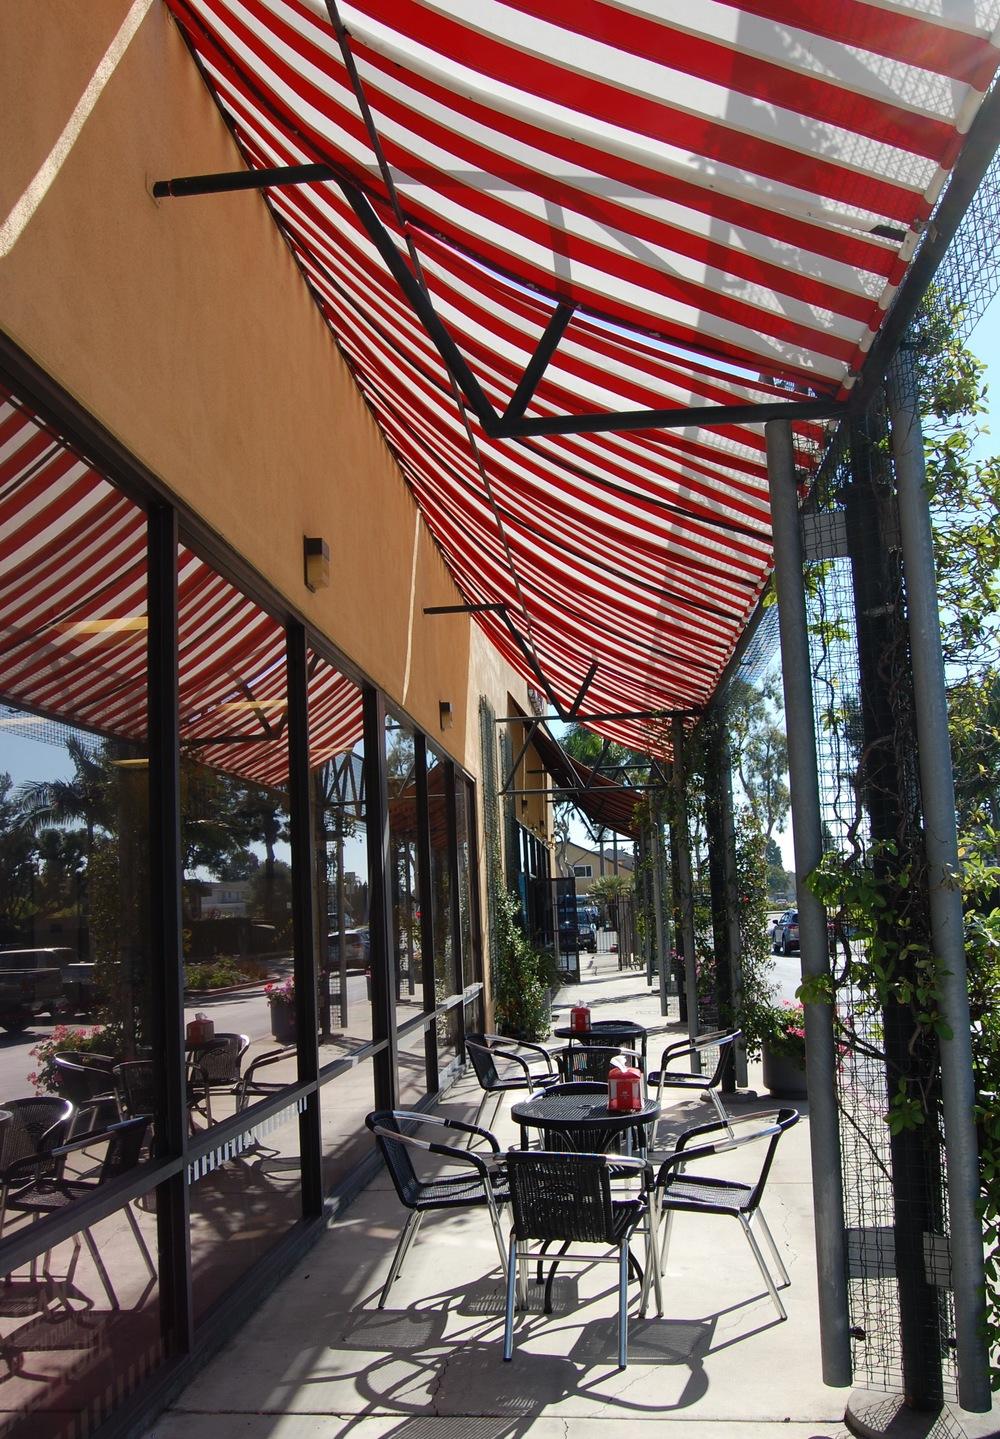 Rita's Italian Ice Huntington Beach (Photo by Lauren Lloyd)